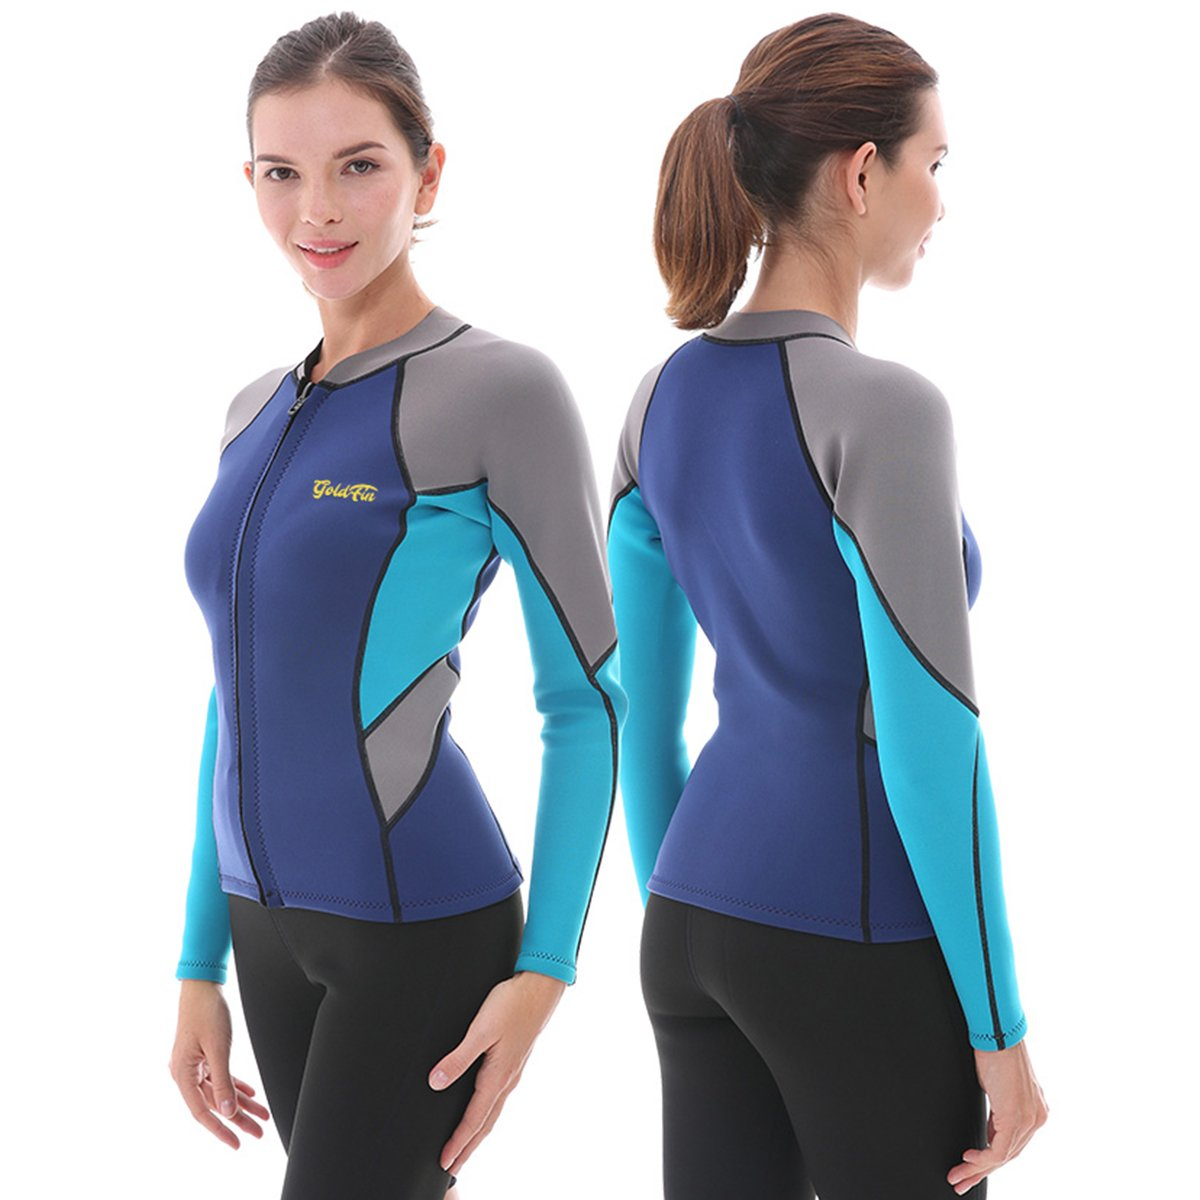 Goldfin Women's Wetsuit Top, 2mm Neoprene Wetsuit Jacket Long Sleeve Front Zip Wetsuit Shirt for Diving Snorkeling Surfing Kayaking Canoeing (Navy, S)